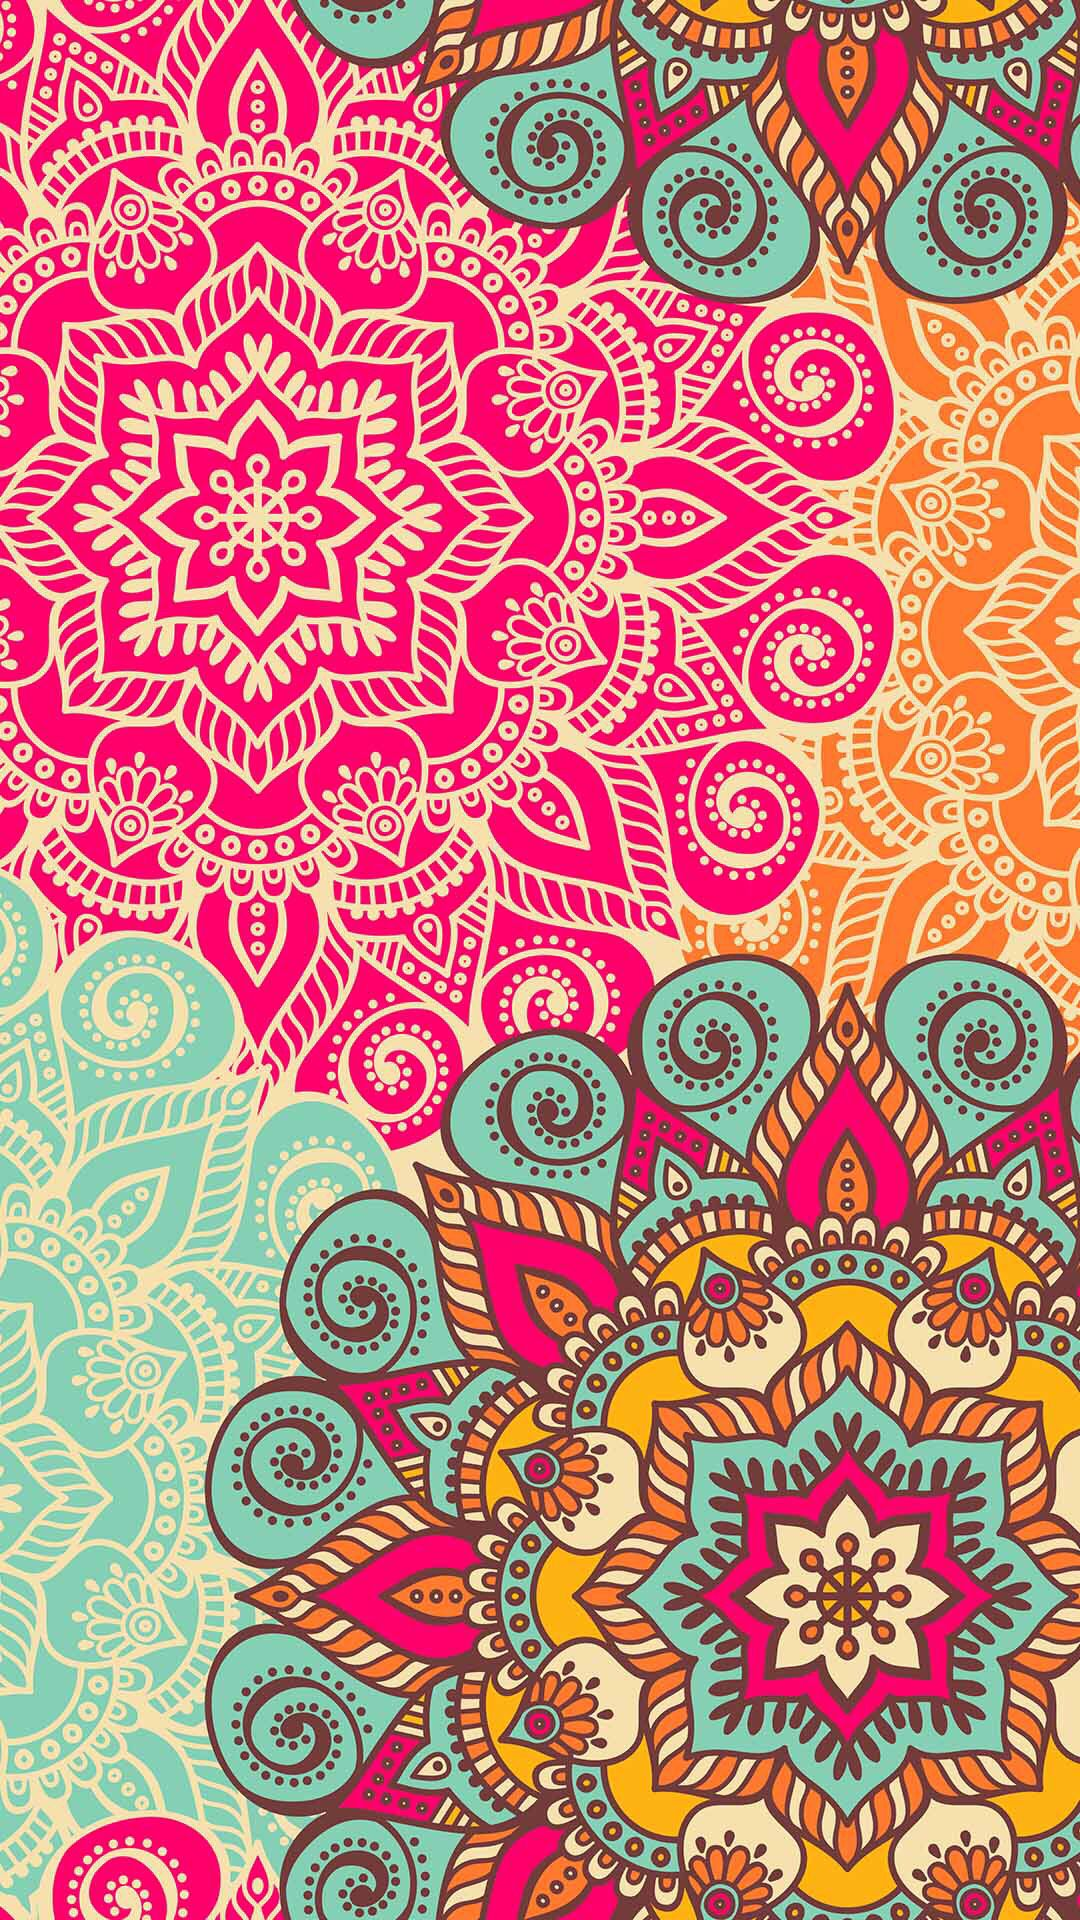 Most Inspiring Wallpaper Mac Spring - b19266701ff01845bc24691f3591a93a  HD_889743.jpg